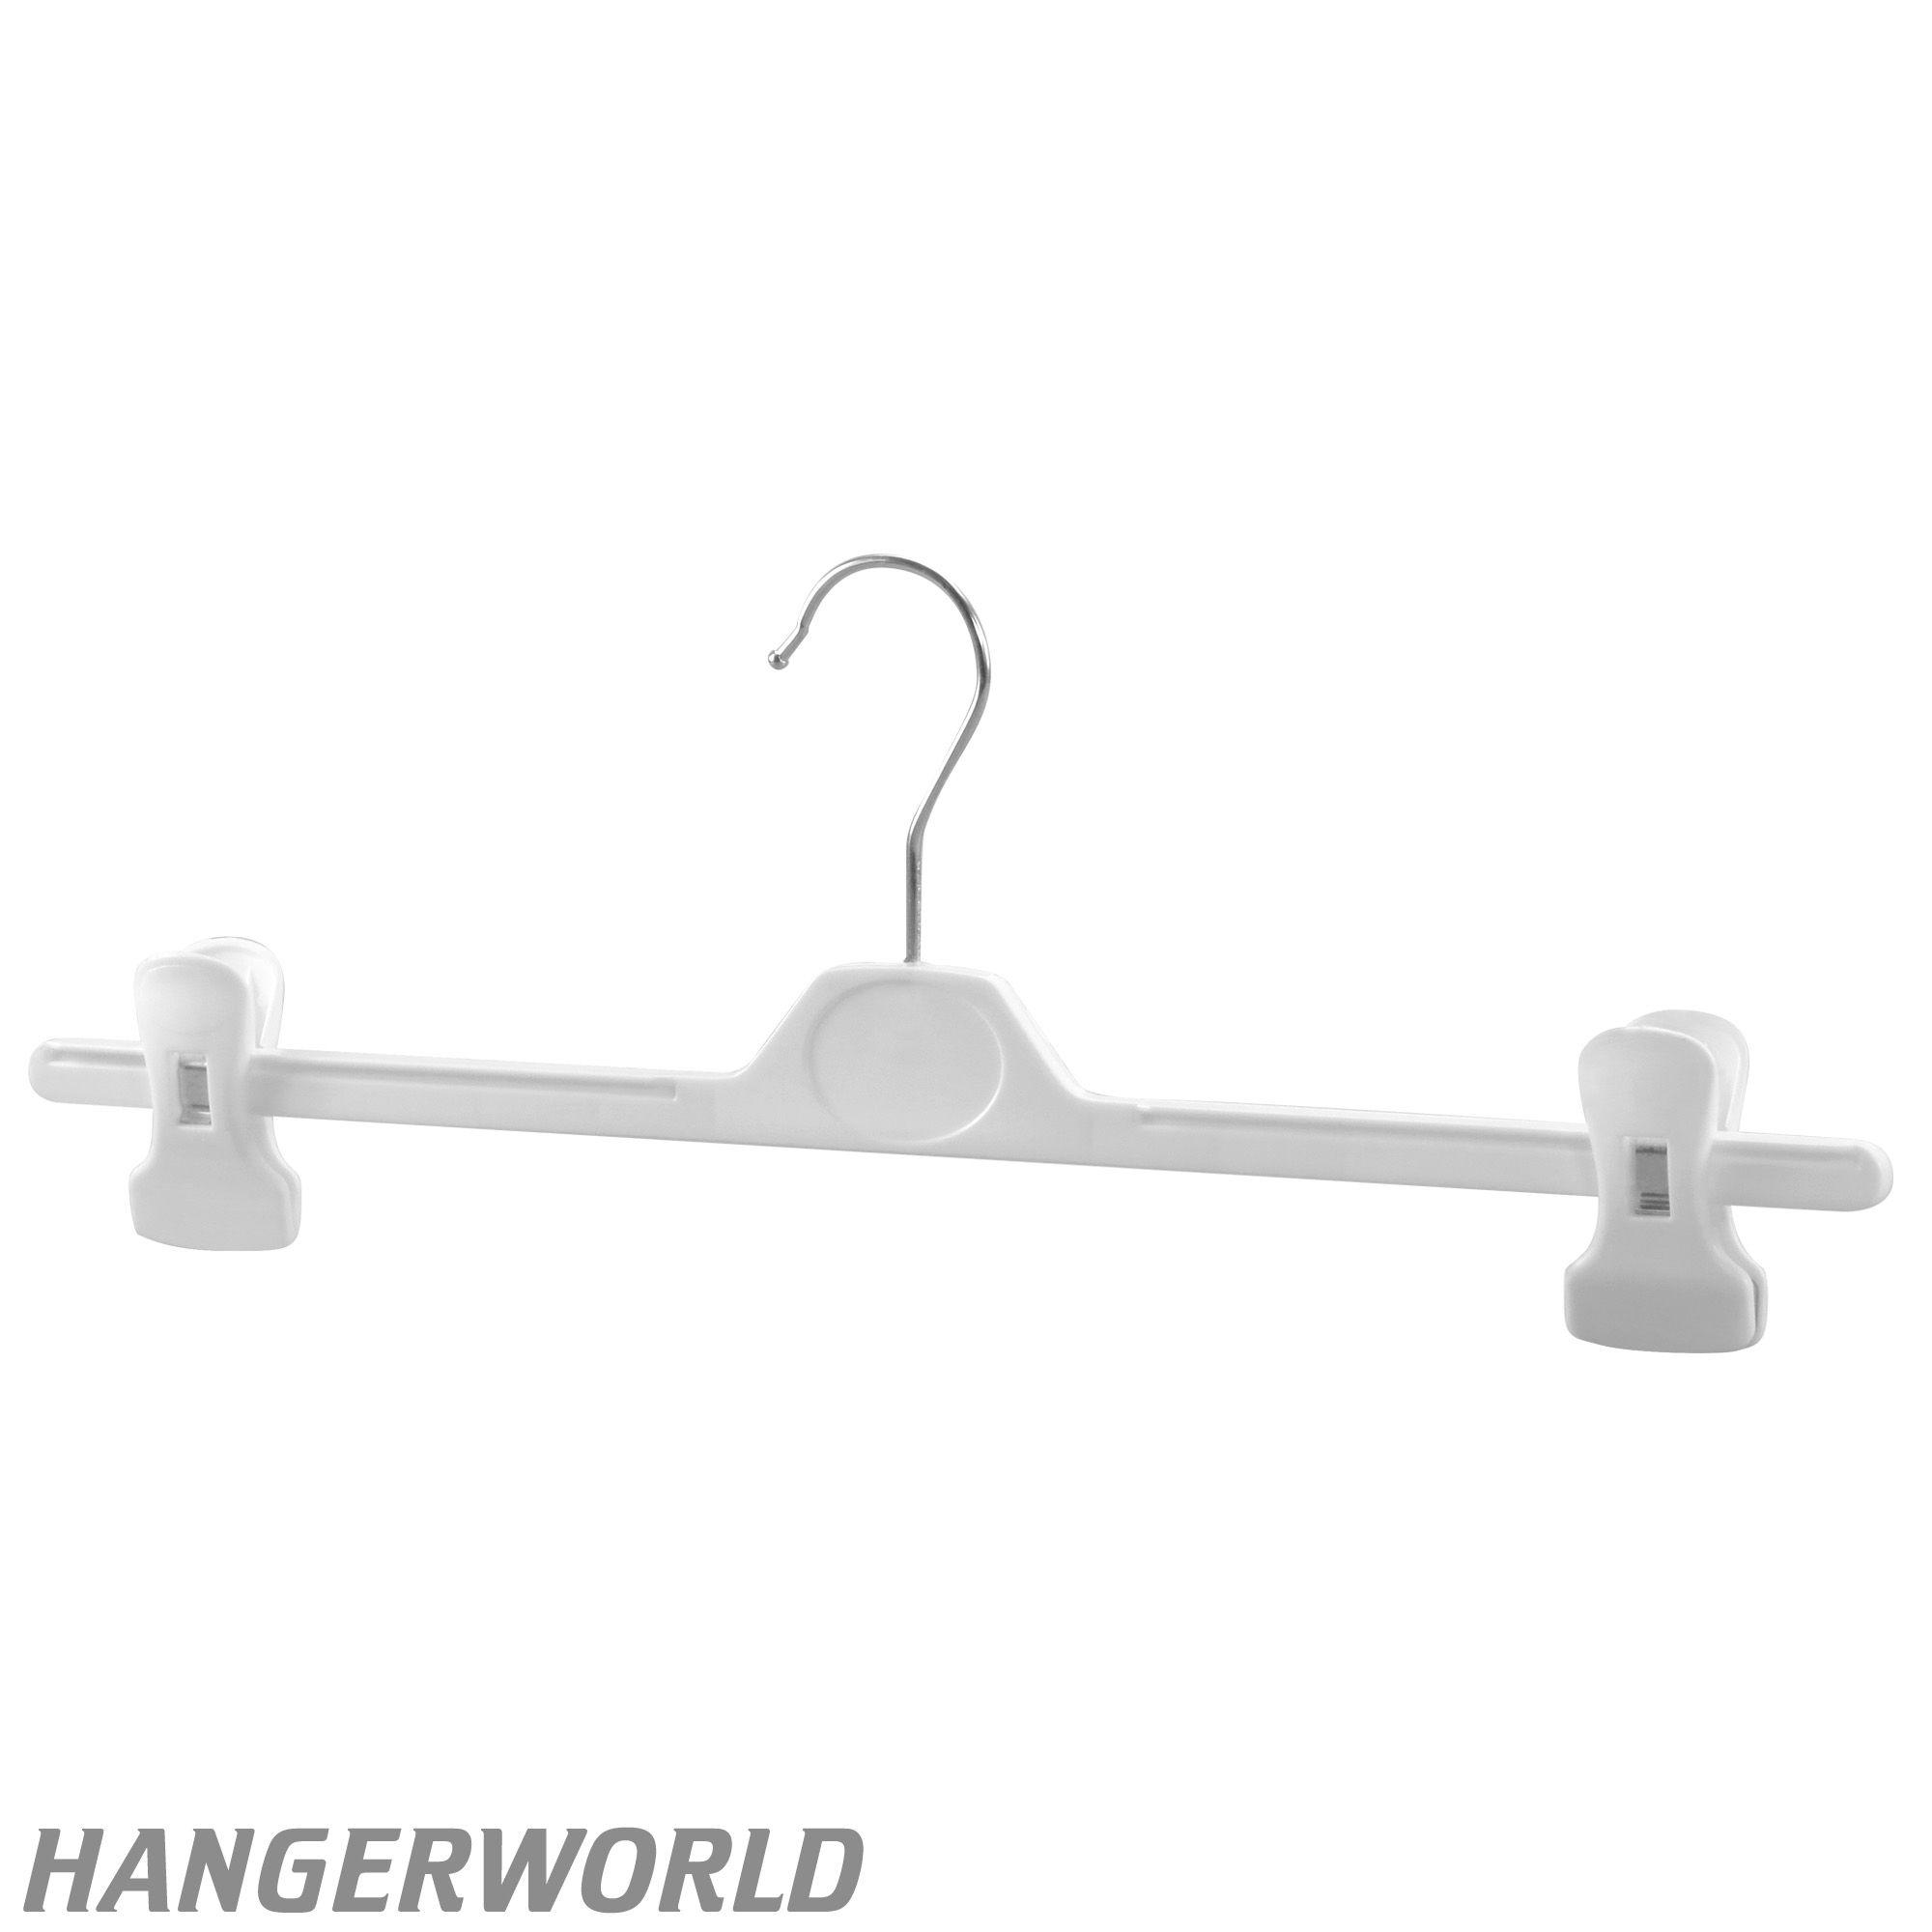 White Adjustable Clip Hangers 40cm Extra Wide Plastic Hangers